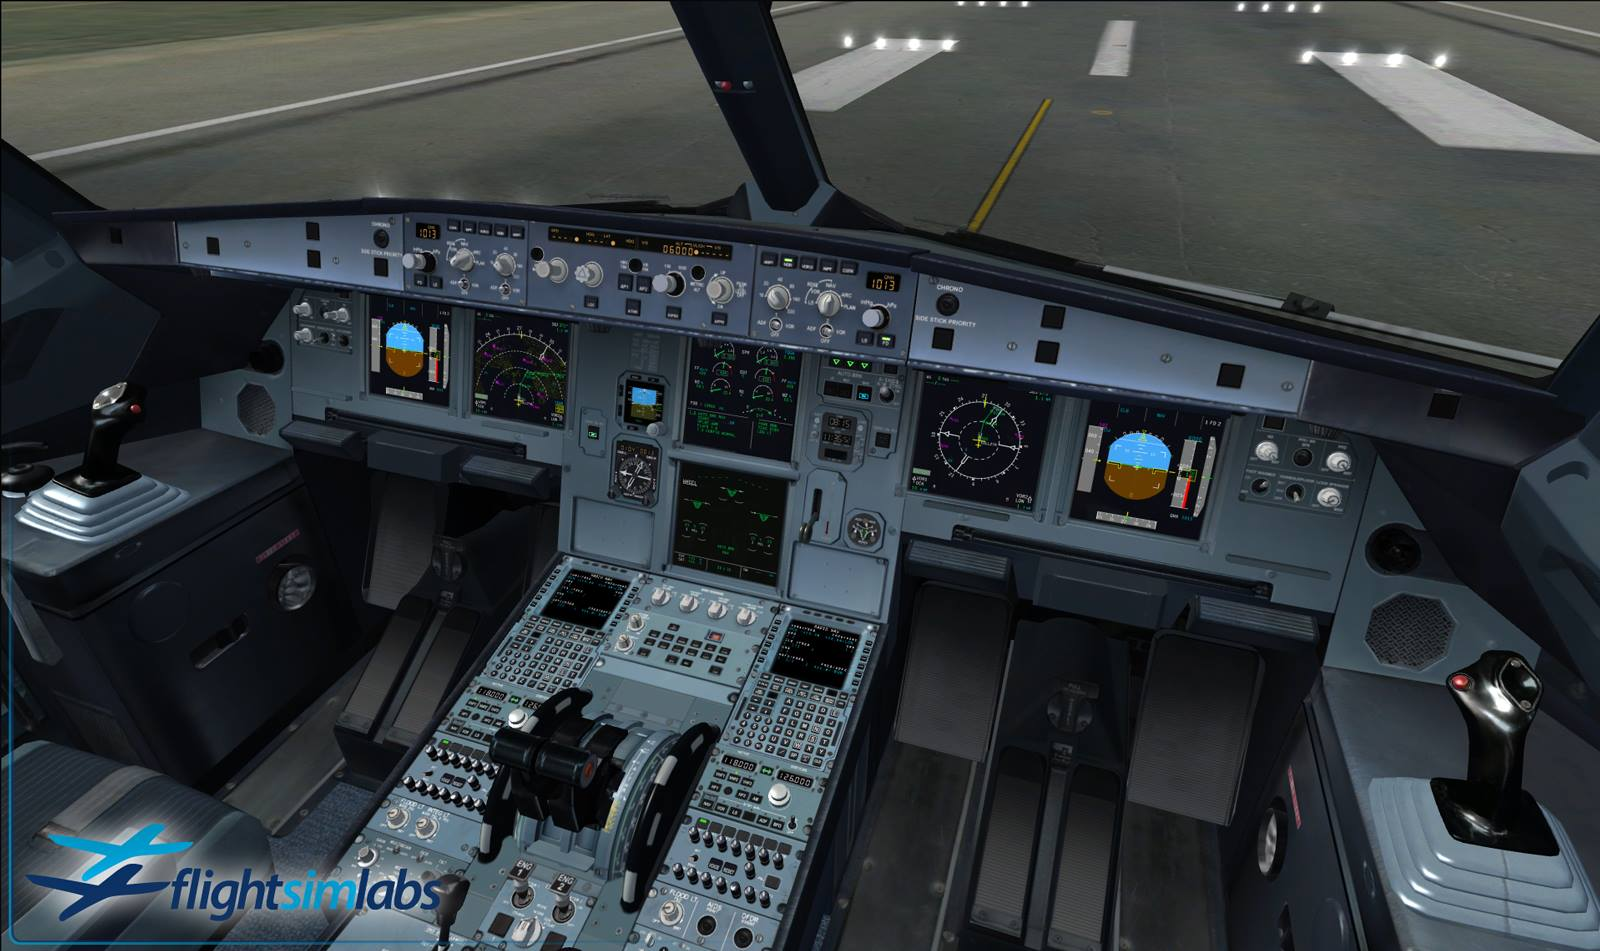 Realflight G3 Rc Flight Simulator Flight Video Magazine